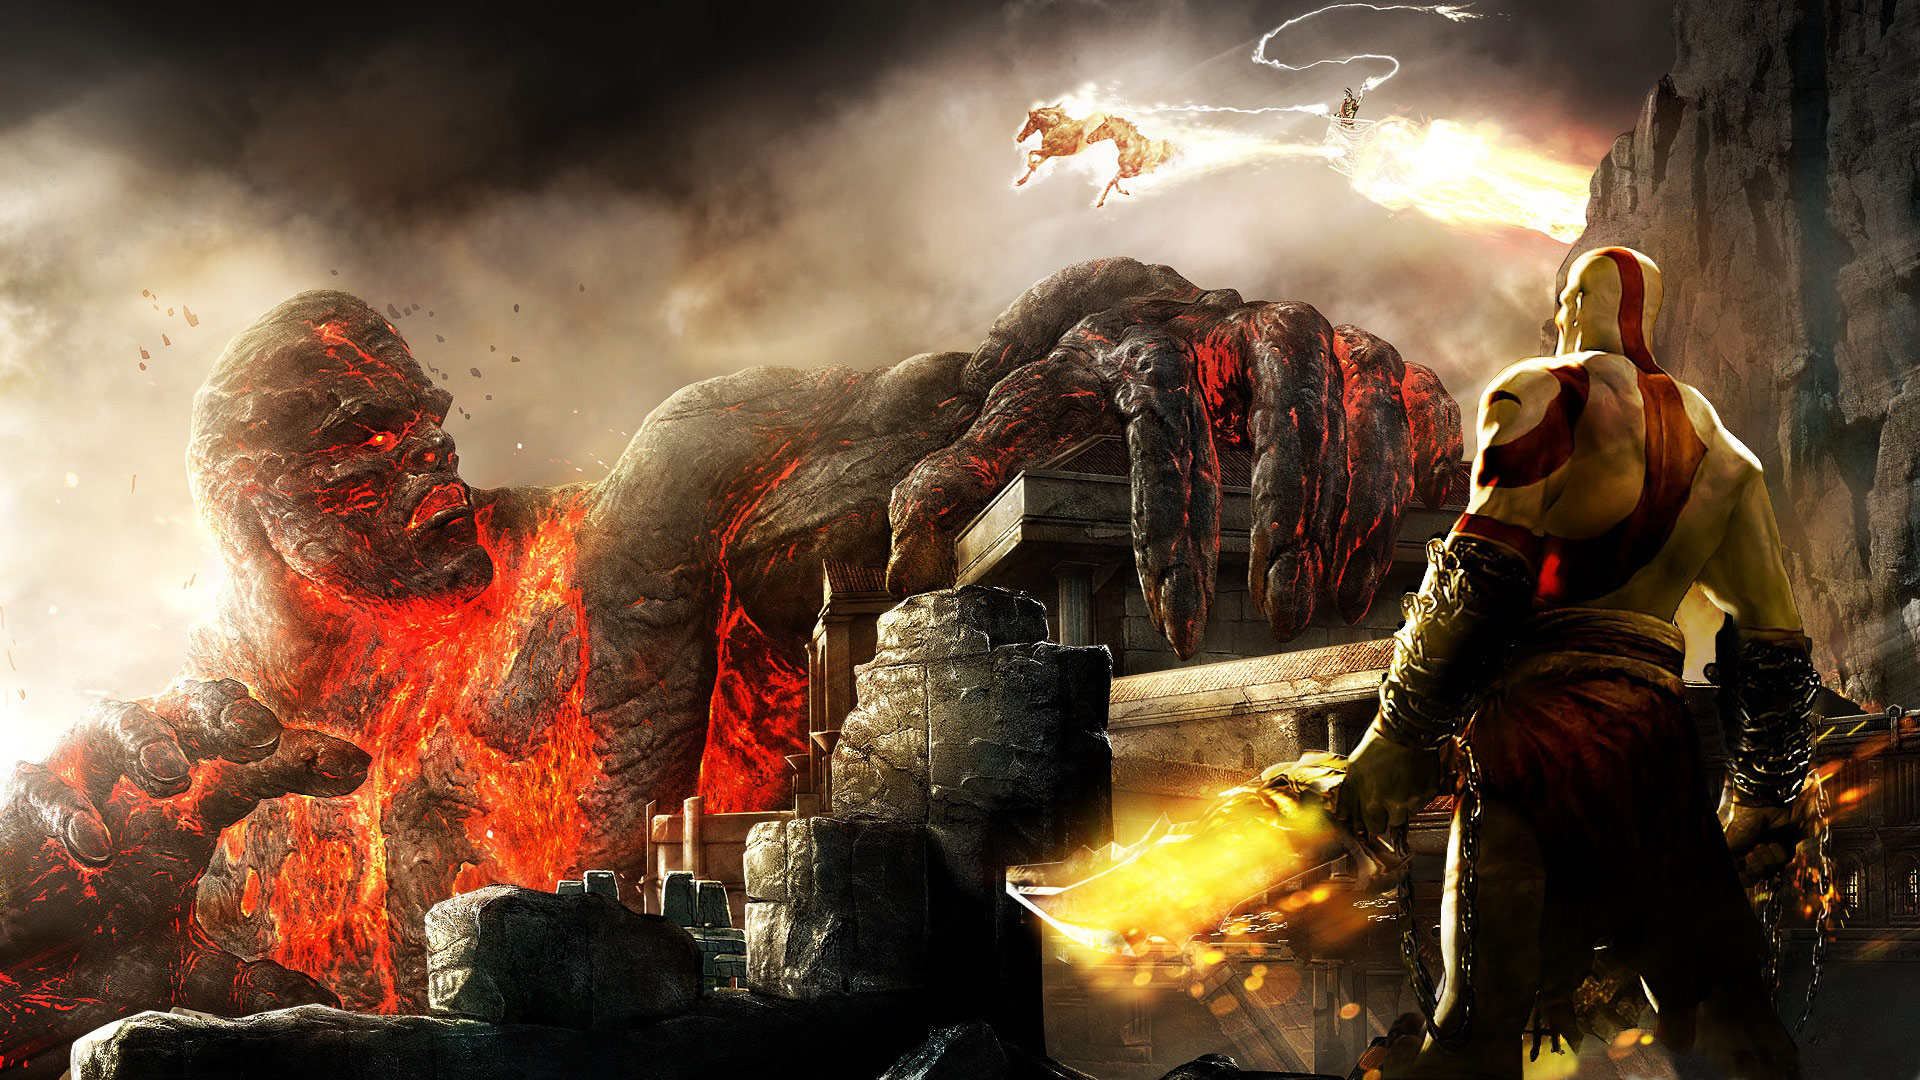 Natal Wallpaper 3d Papel De Parede Pc God Of War Hd Papel De Parede Gr 225 Tis